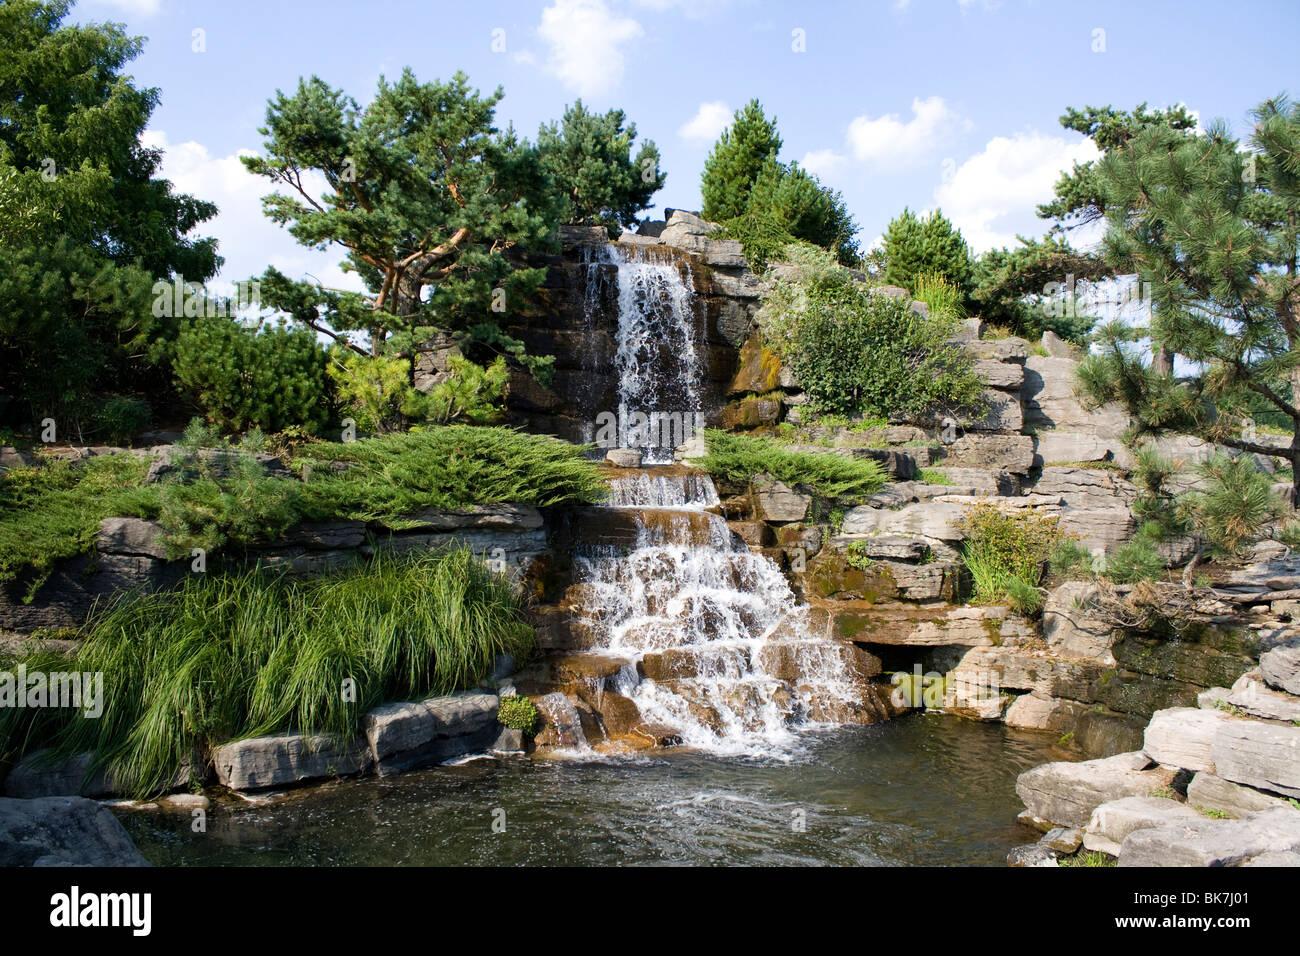 montreal botanical garden alpine garden stock photo. Black Bedroom Furniture Sets. Home Design Ideas